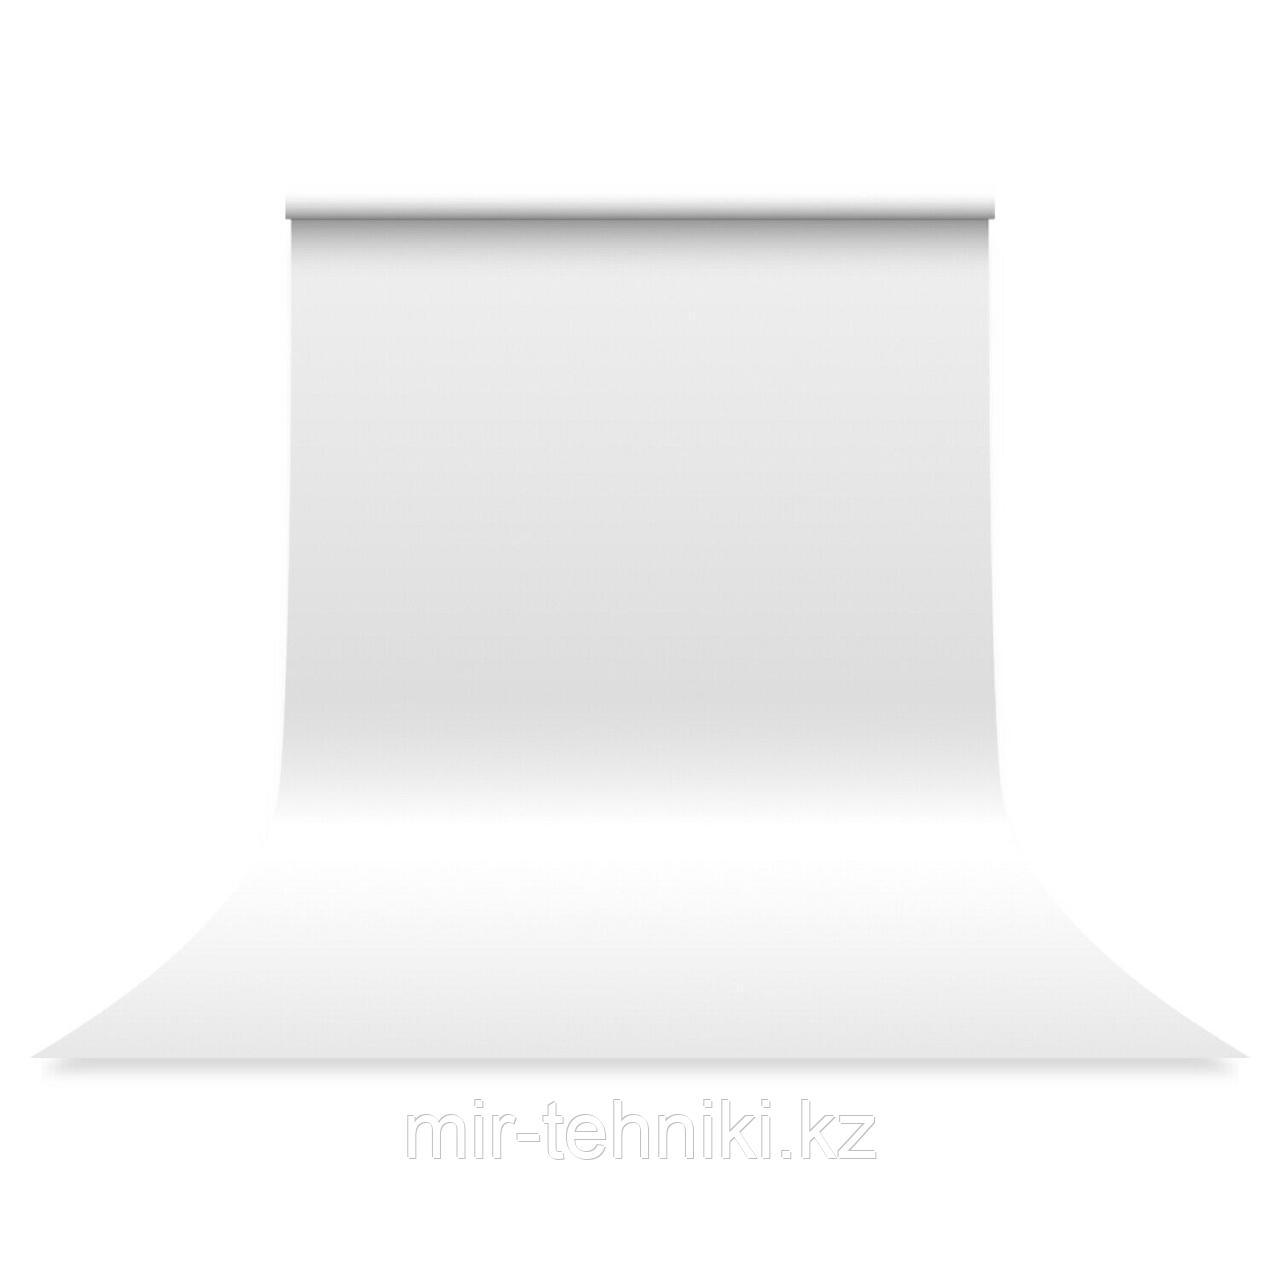 Белый фон E-Image 3 * 6 м  Муслин  (MB36)